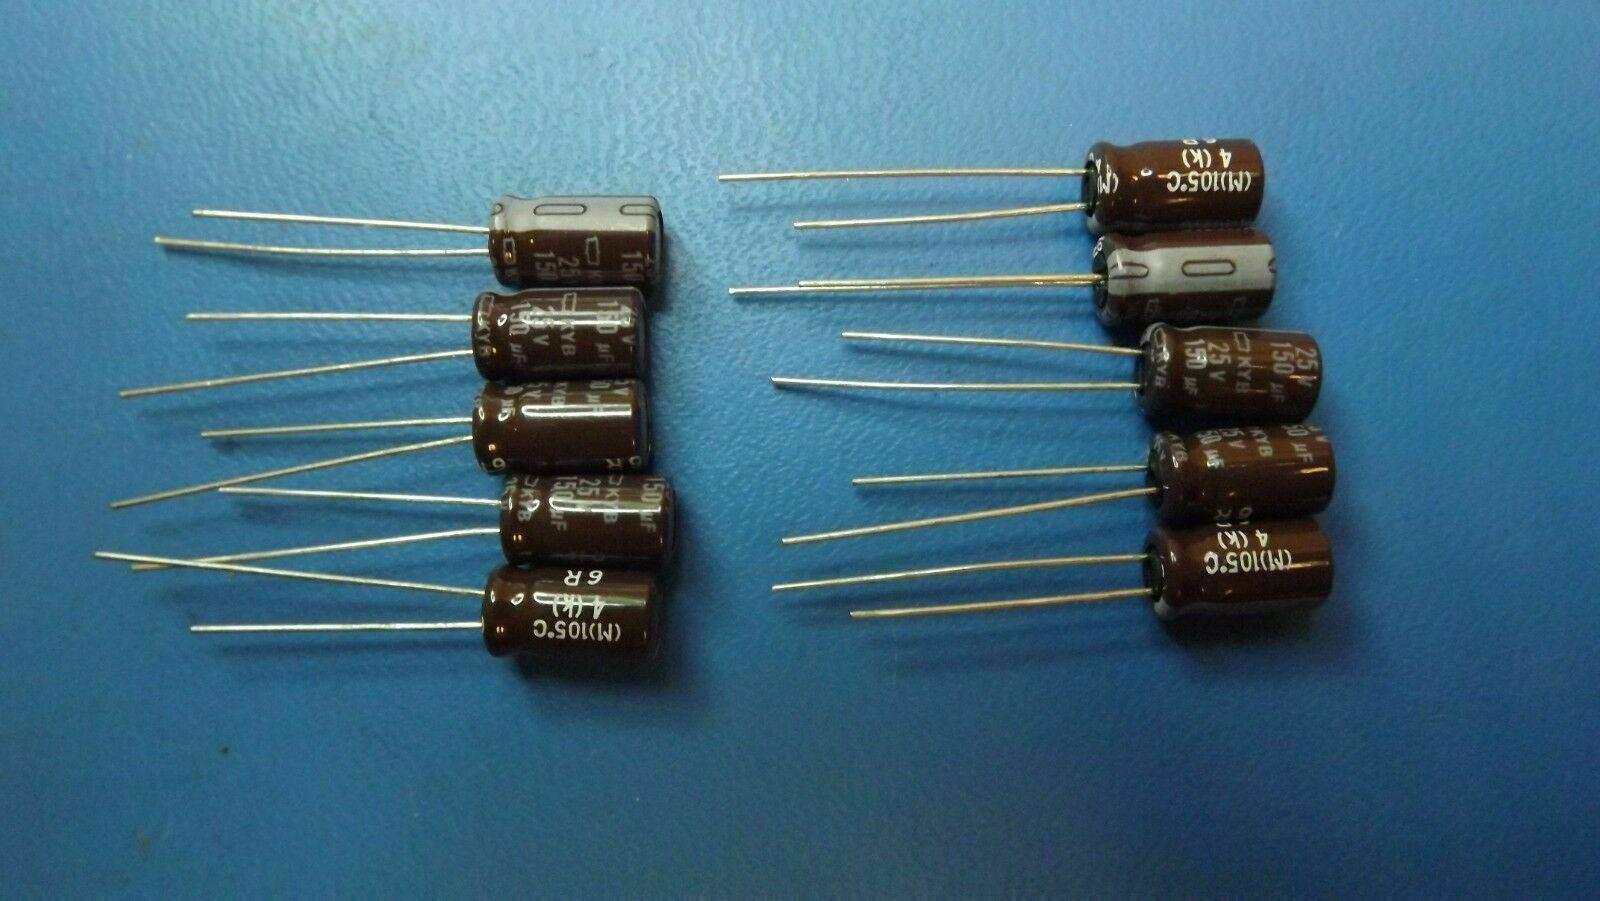 100UF 25V KME25VB100M  NIPPON CAPS 6.3 X 11 20/% 105C RADIAL  25PCS